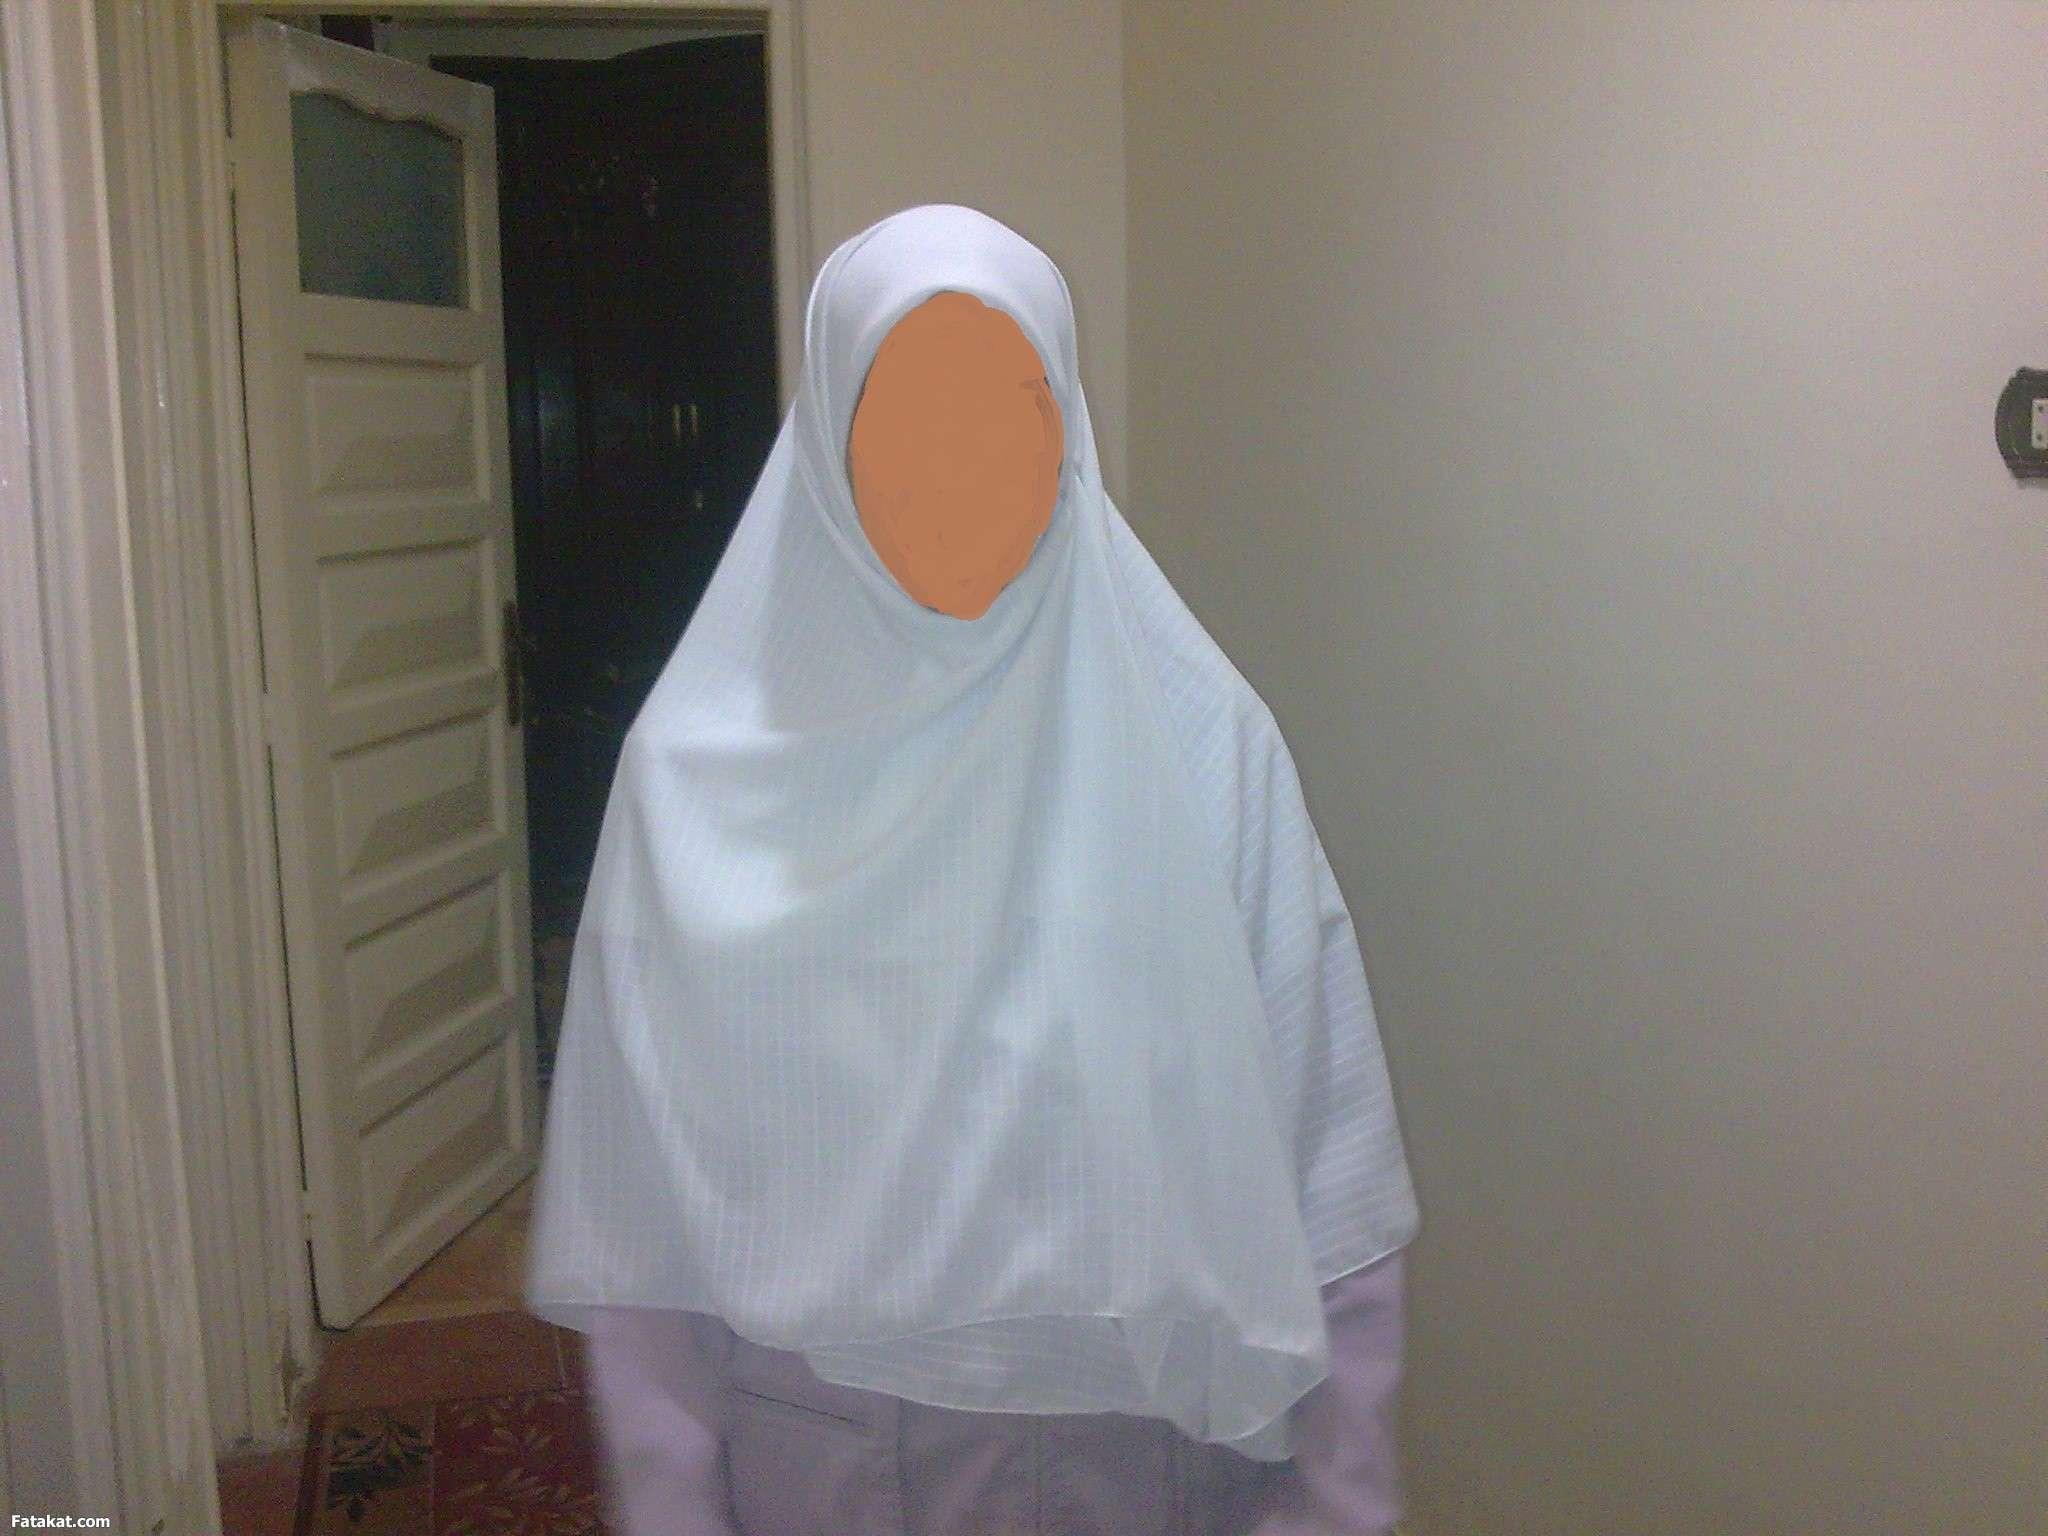 بالصور بنات محجبات , اجمل صور محجبات بالخمار الماليزي 4325 4